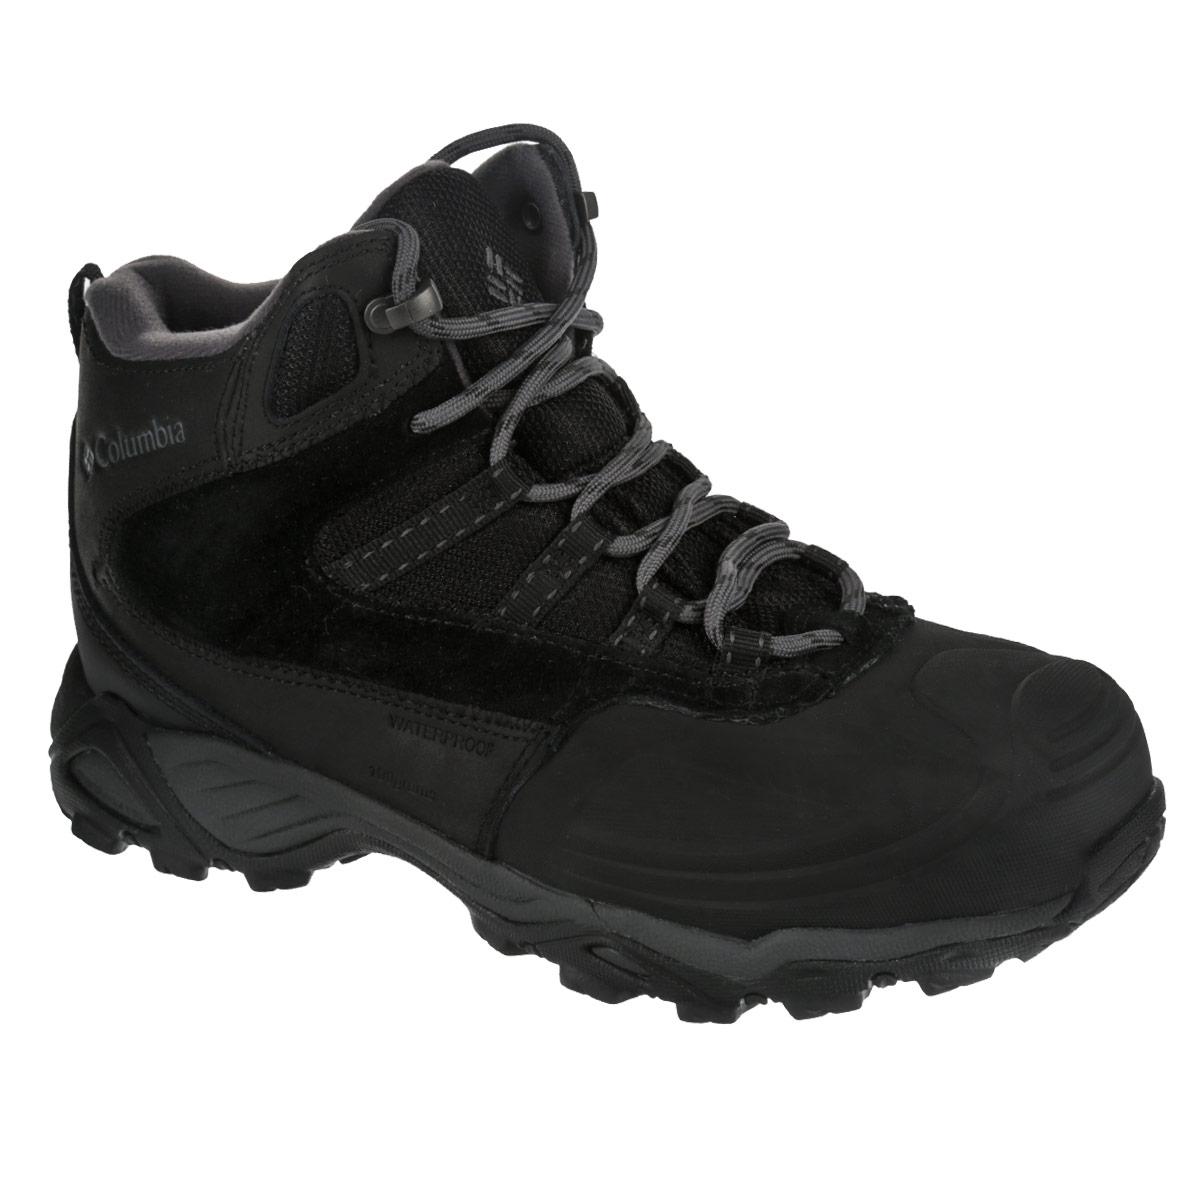 Ботинки мужские трекинговые Silcox II Waterproof. BM1604